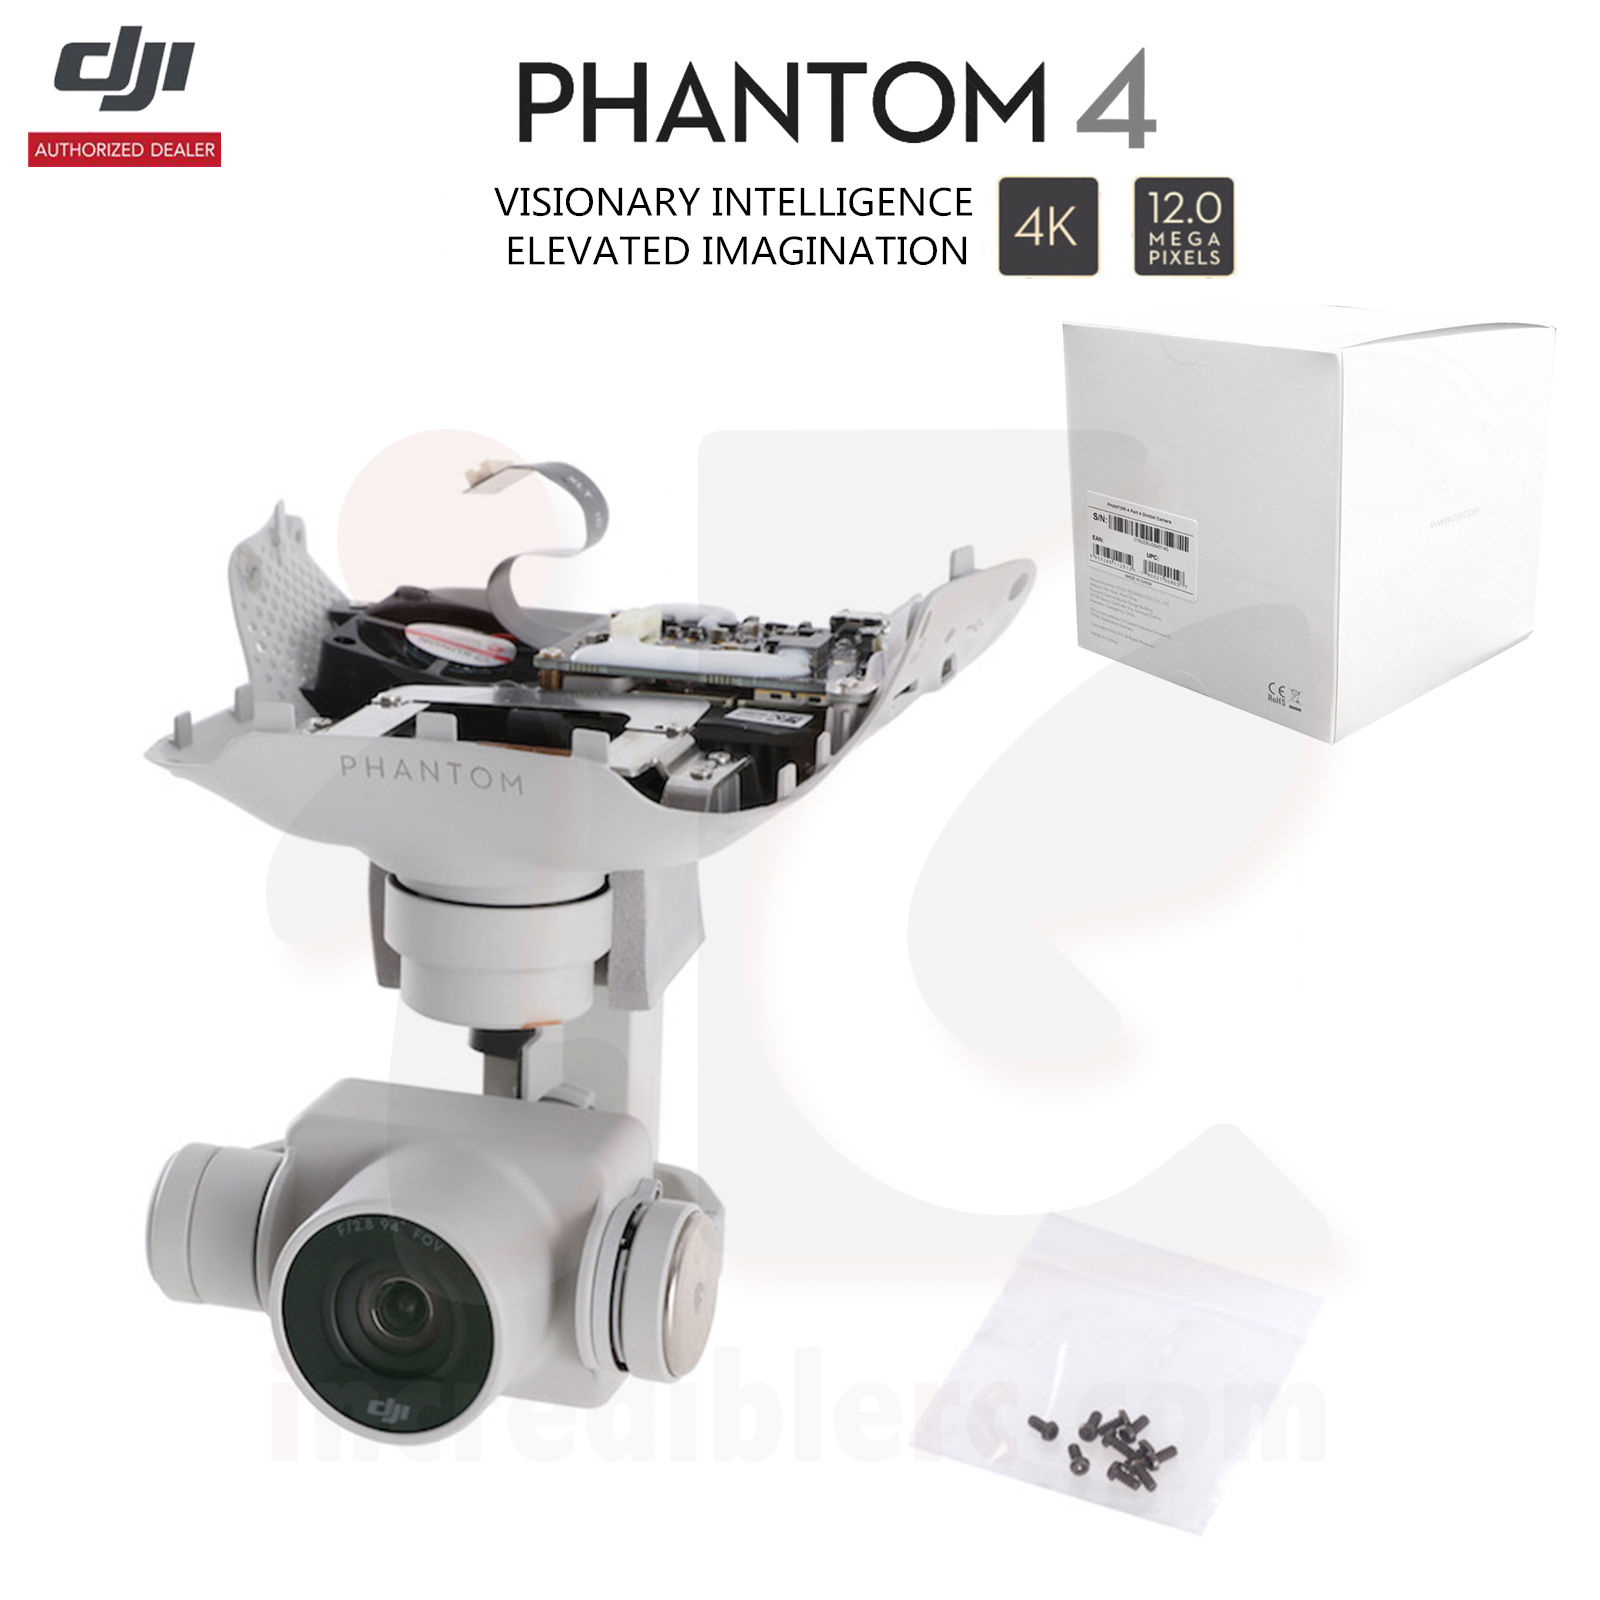 DJI Phantom 4 Drone Part 4 Gimbal Camera for Sale in ...